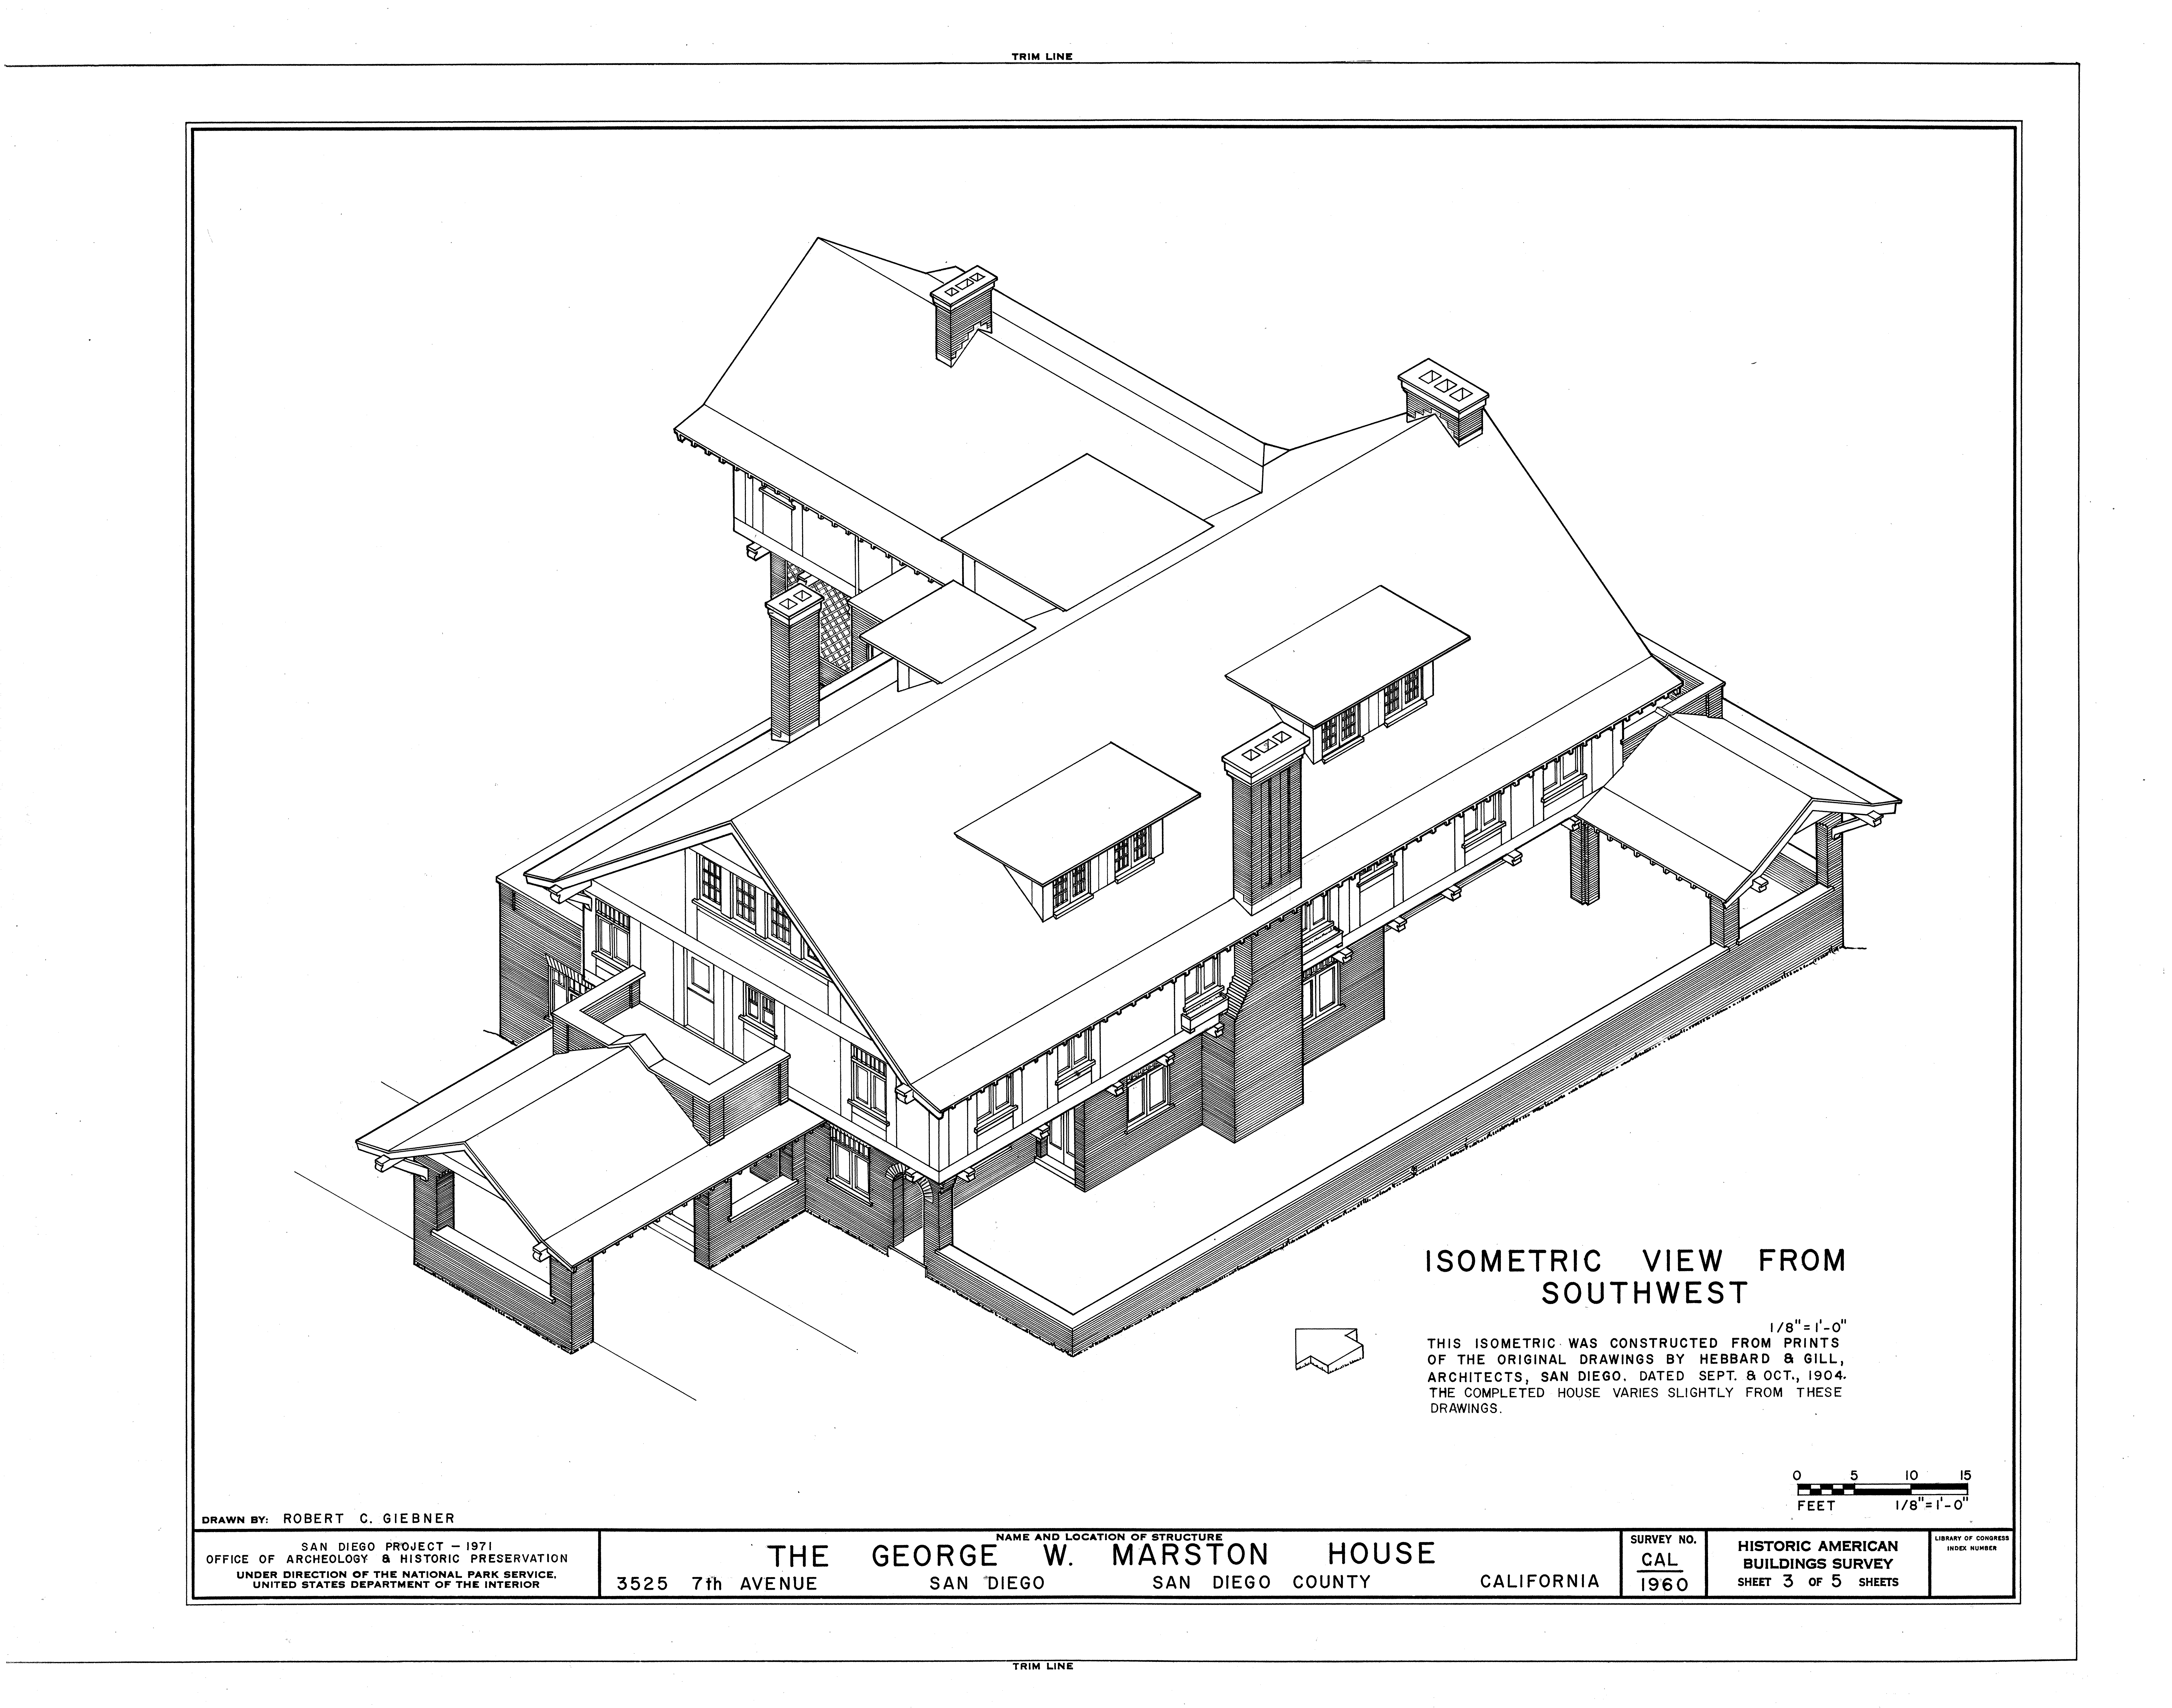 9642x7584 Filegeorge W. Marston House, 3525 Seventh Avenue, San Diego, San